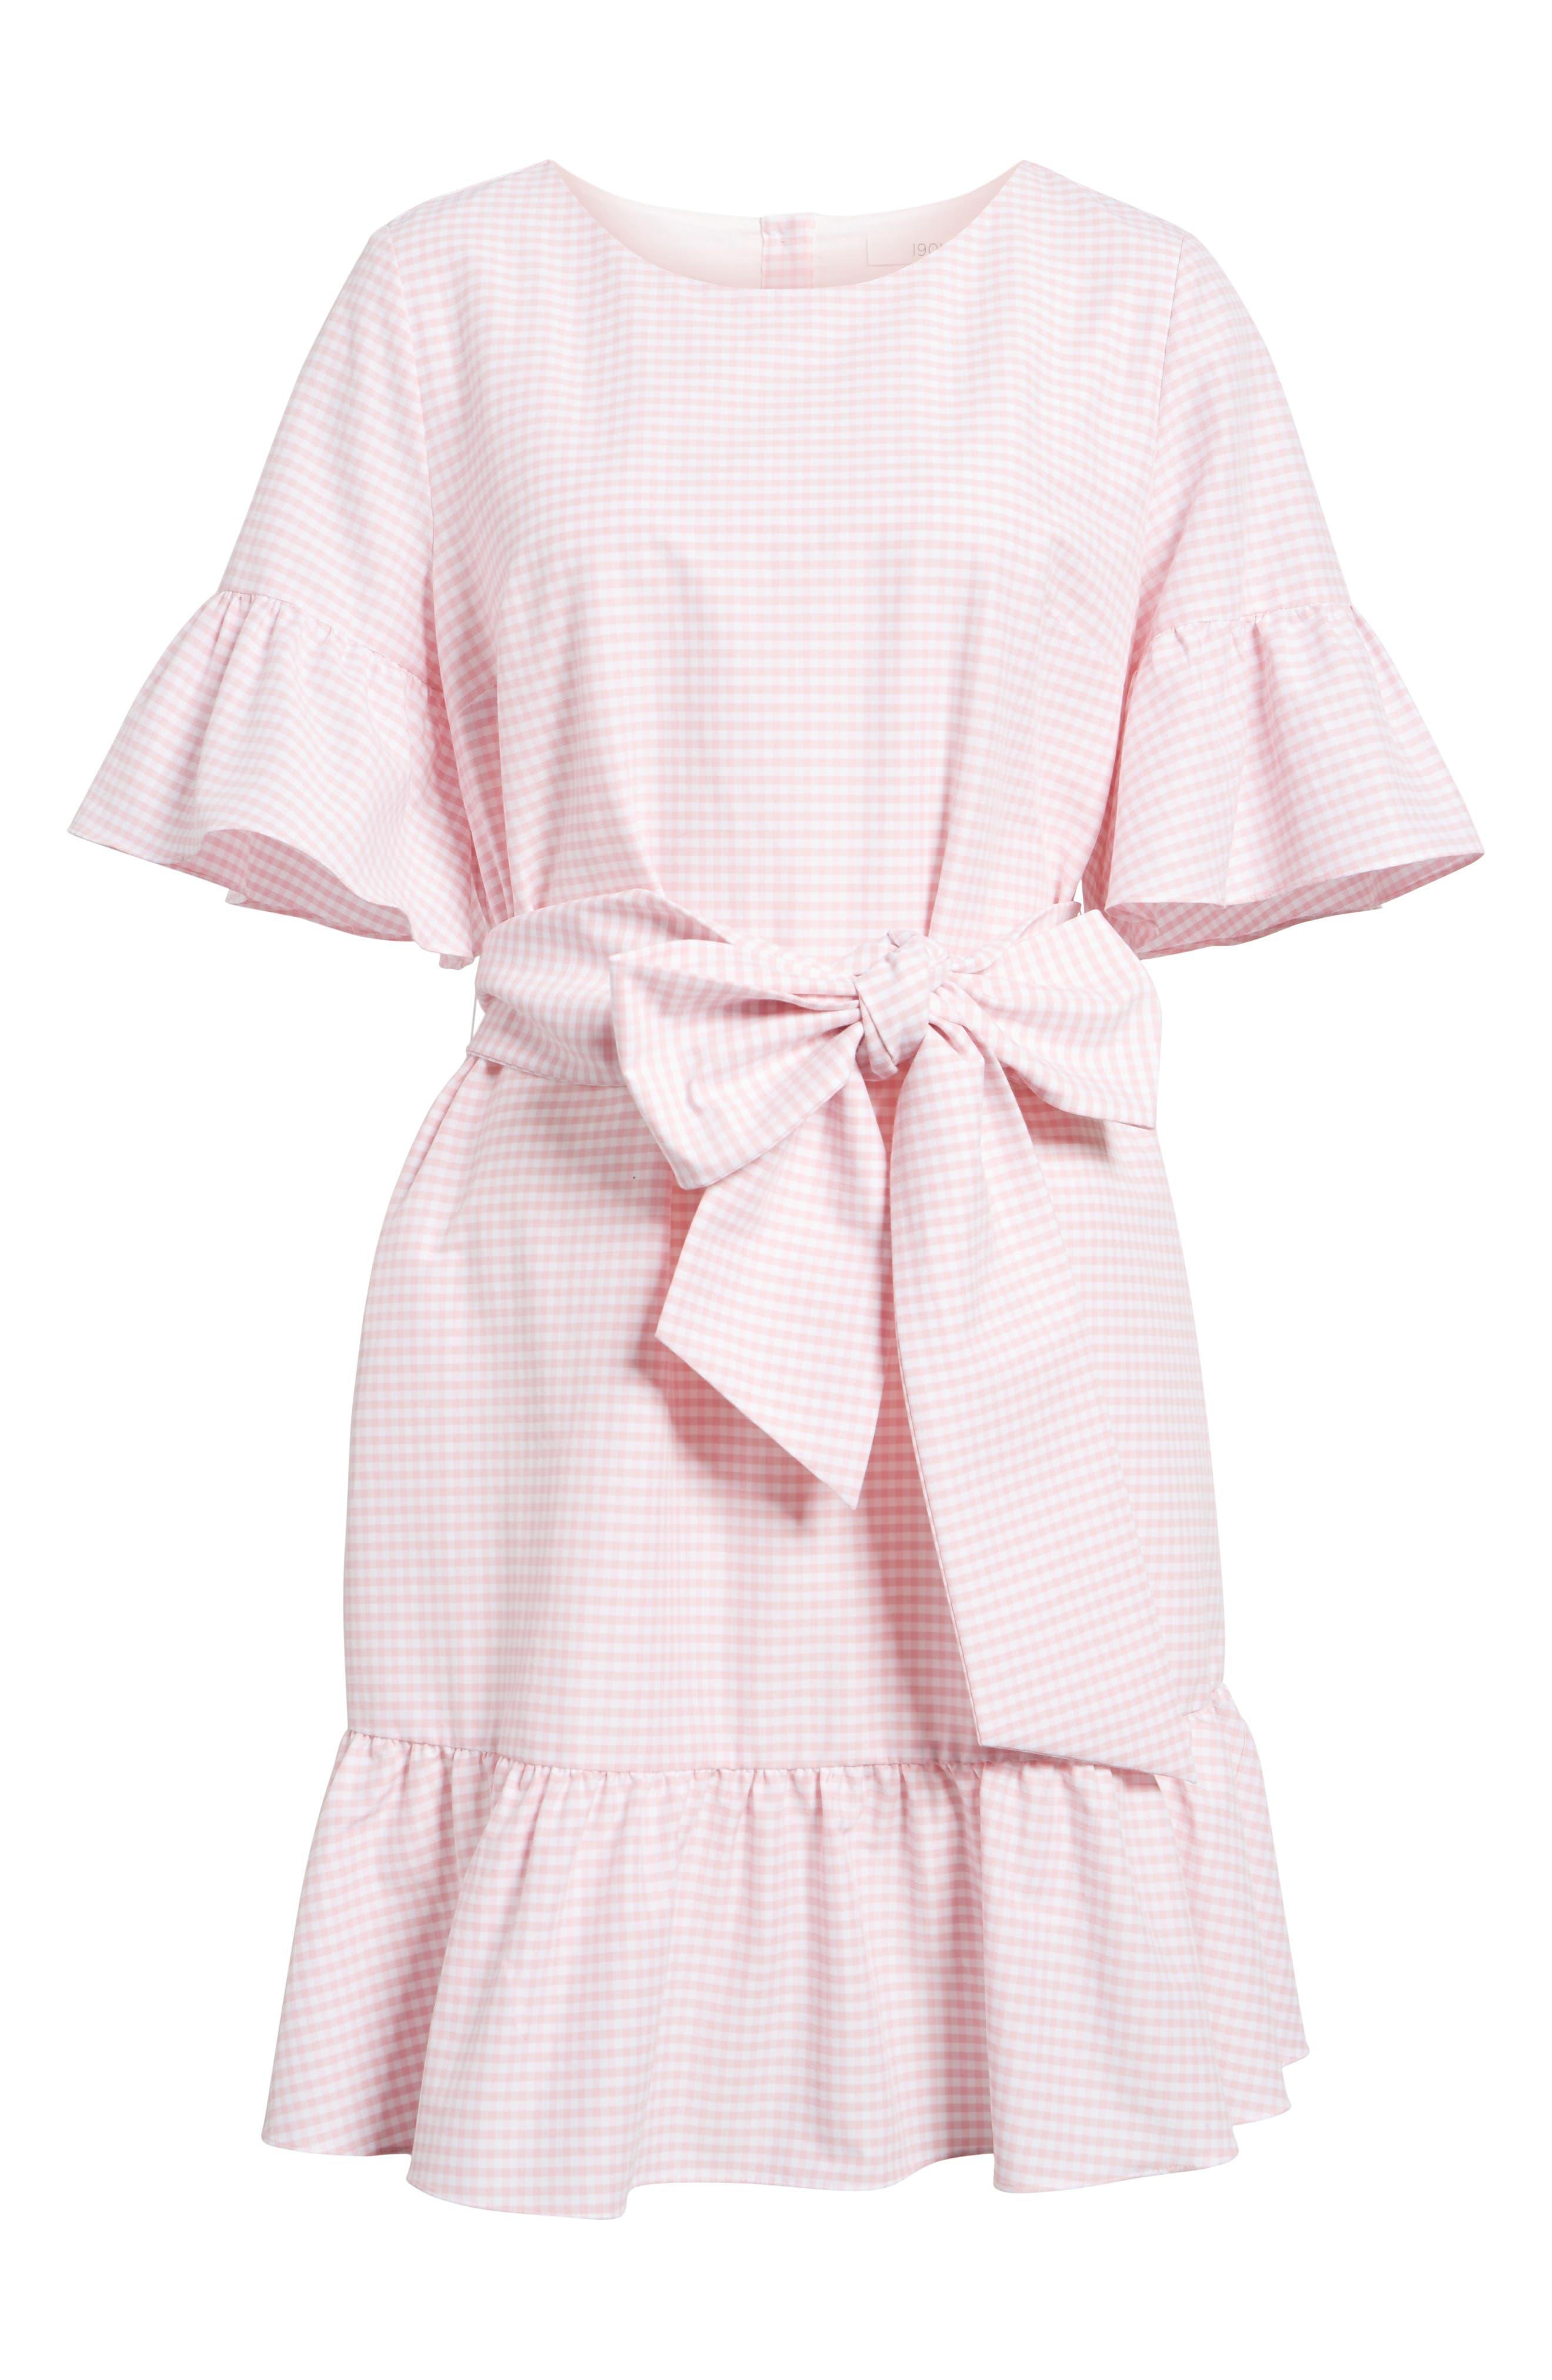 Ruffle & Bow Dress,                             Alternate thumbnail 21, color,